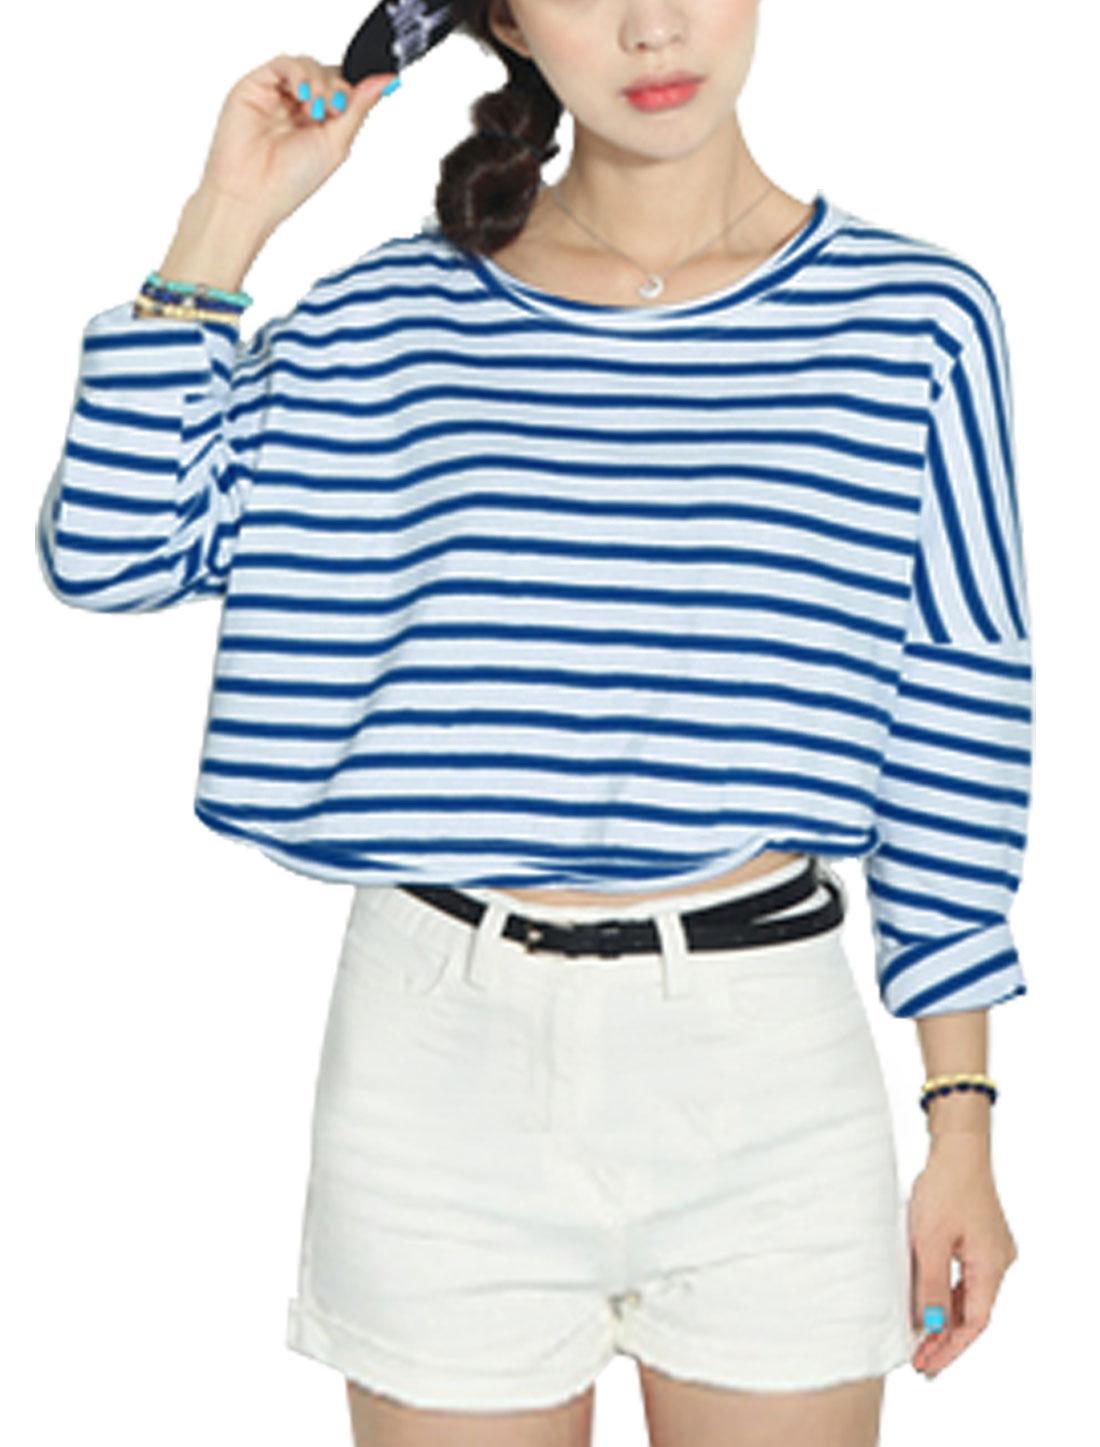 Lady Horizontal Stripes Pattern Slipover Design Bolero Top Blue White XS